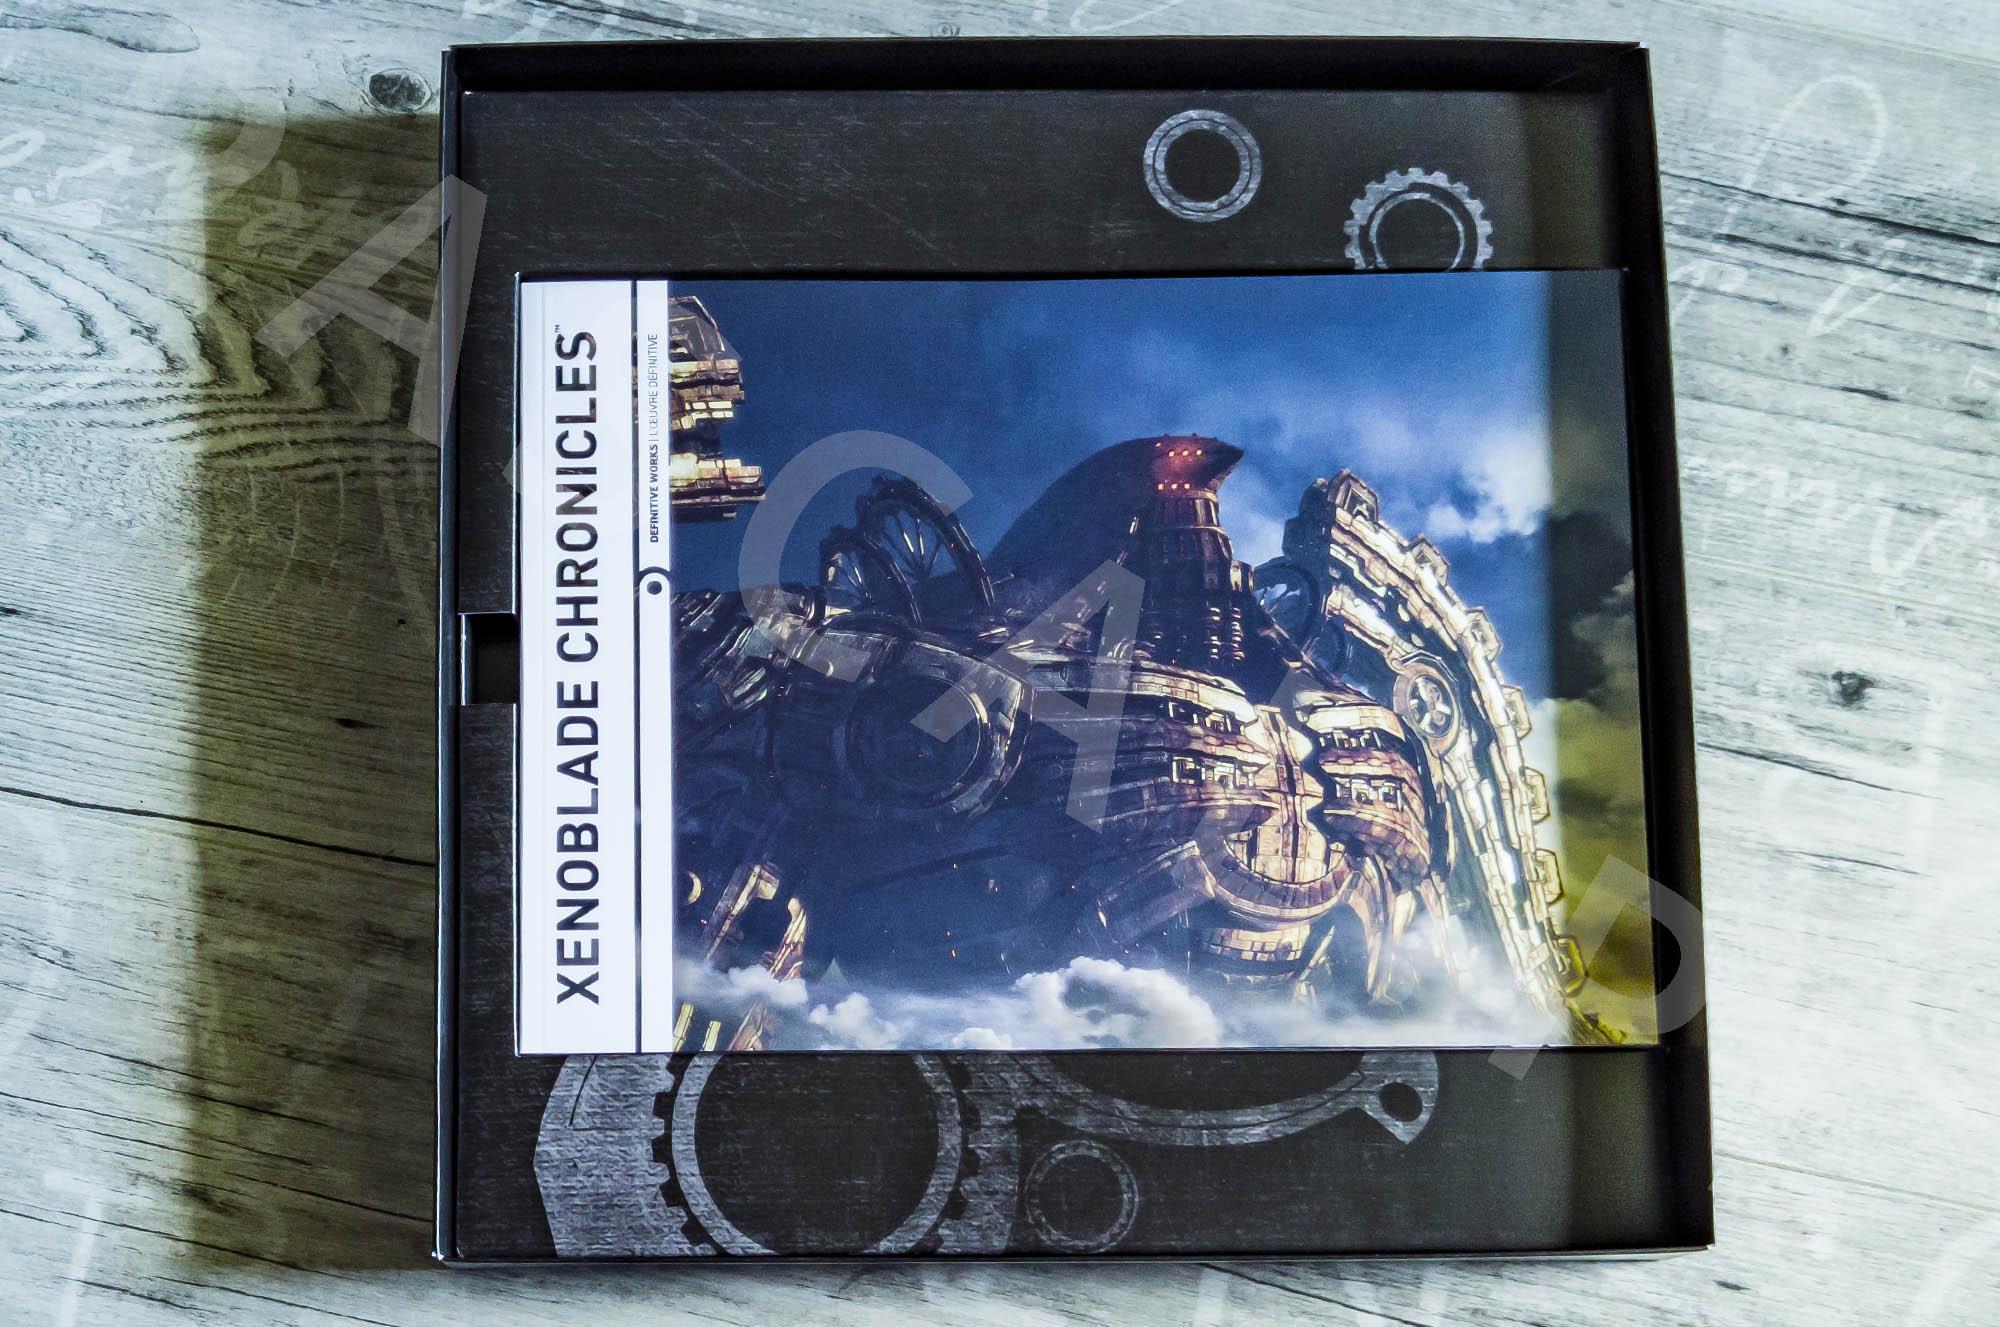 Xenoblade Chronicles Definitive Edition Collectors Set - Artbook